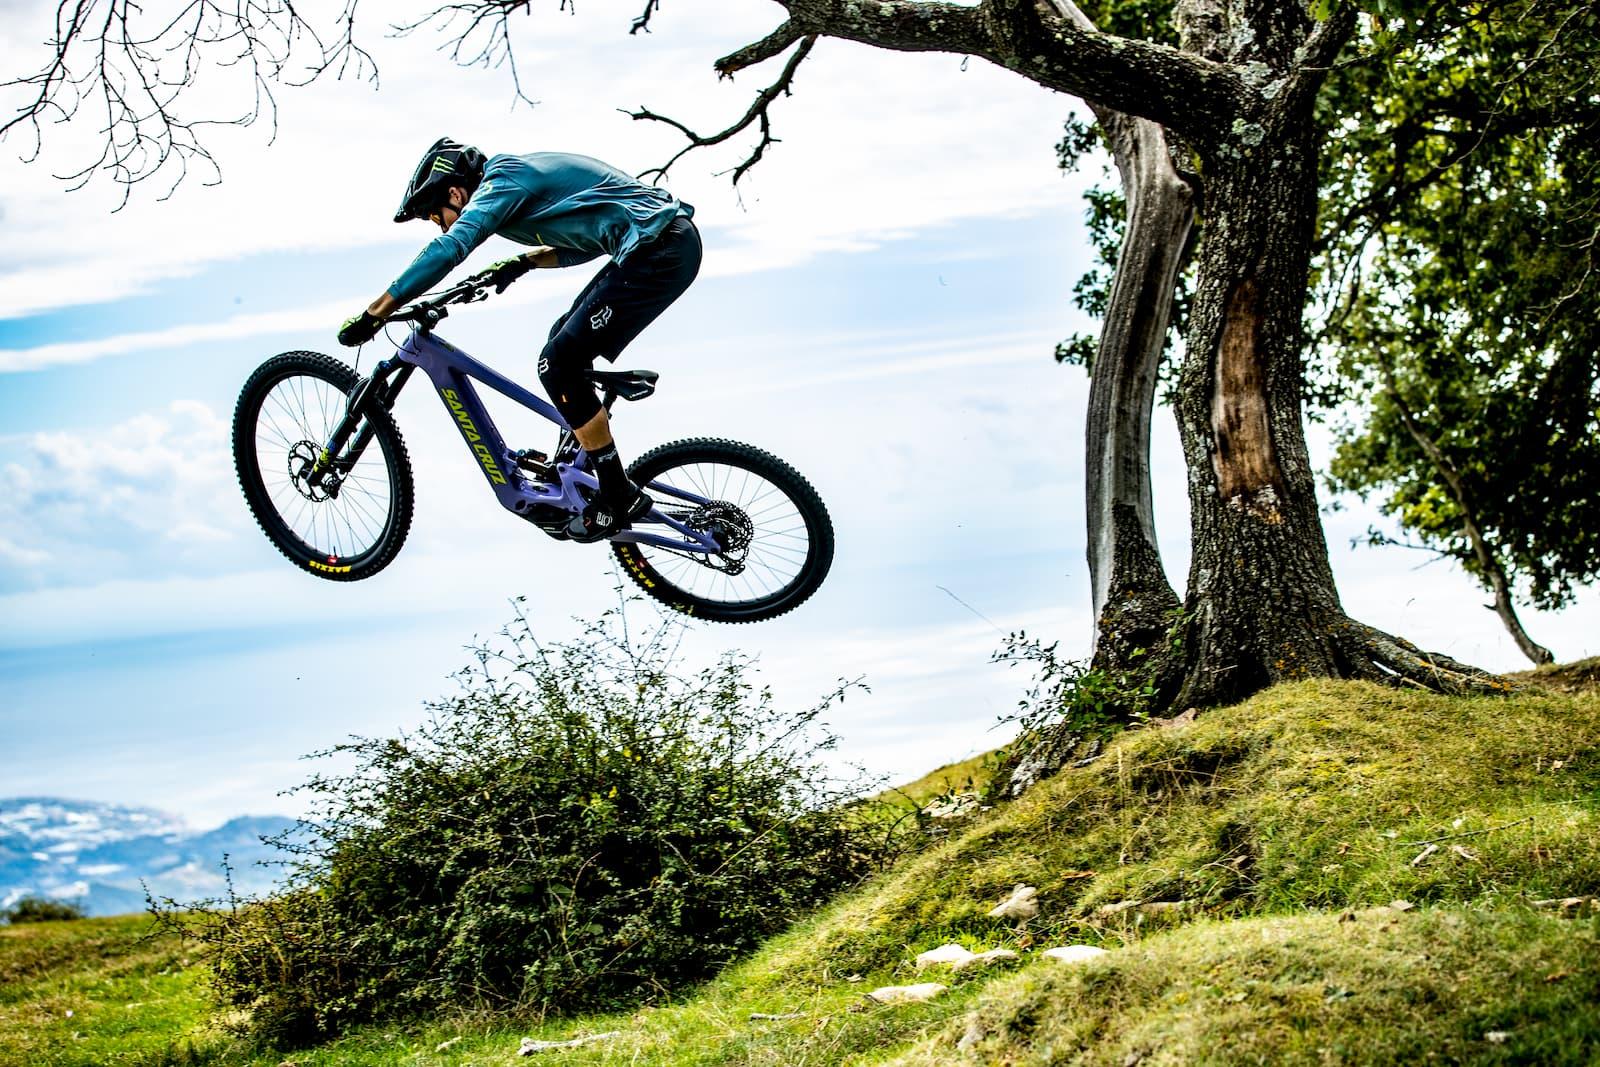 Santa Cruz Bikes Provide High-Quality Craftsmanship and Warranty